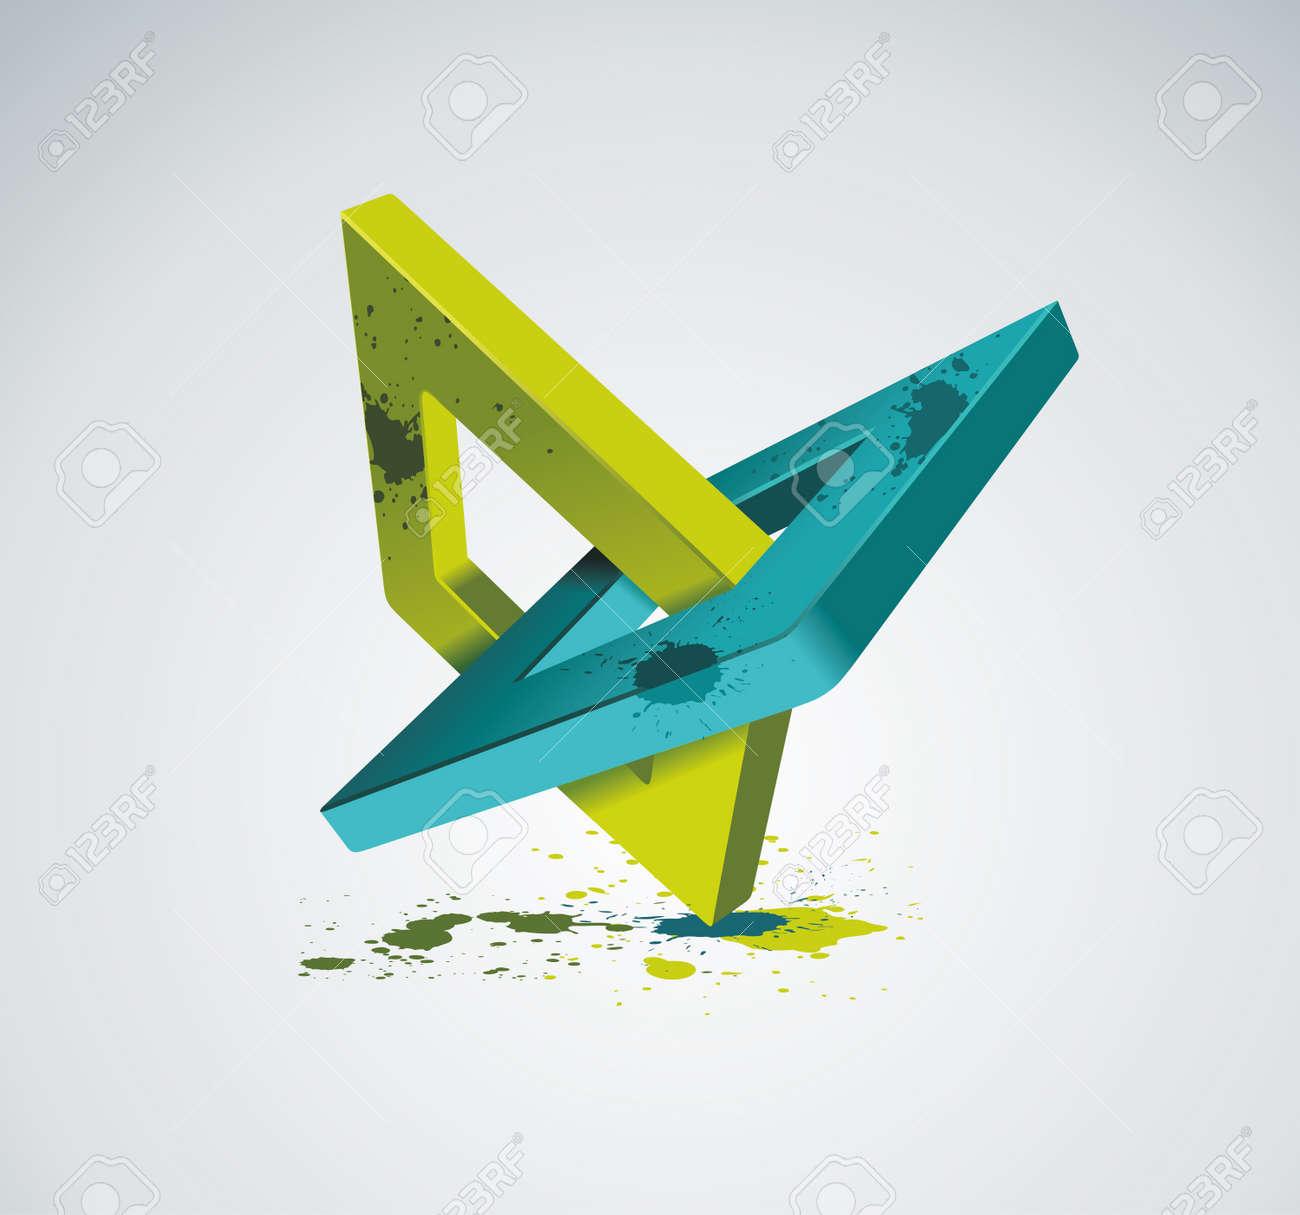 Illustration with orthogonal rhomb symbols Unity concept Vector Stock Vector - 19430478